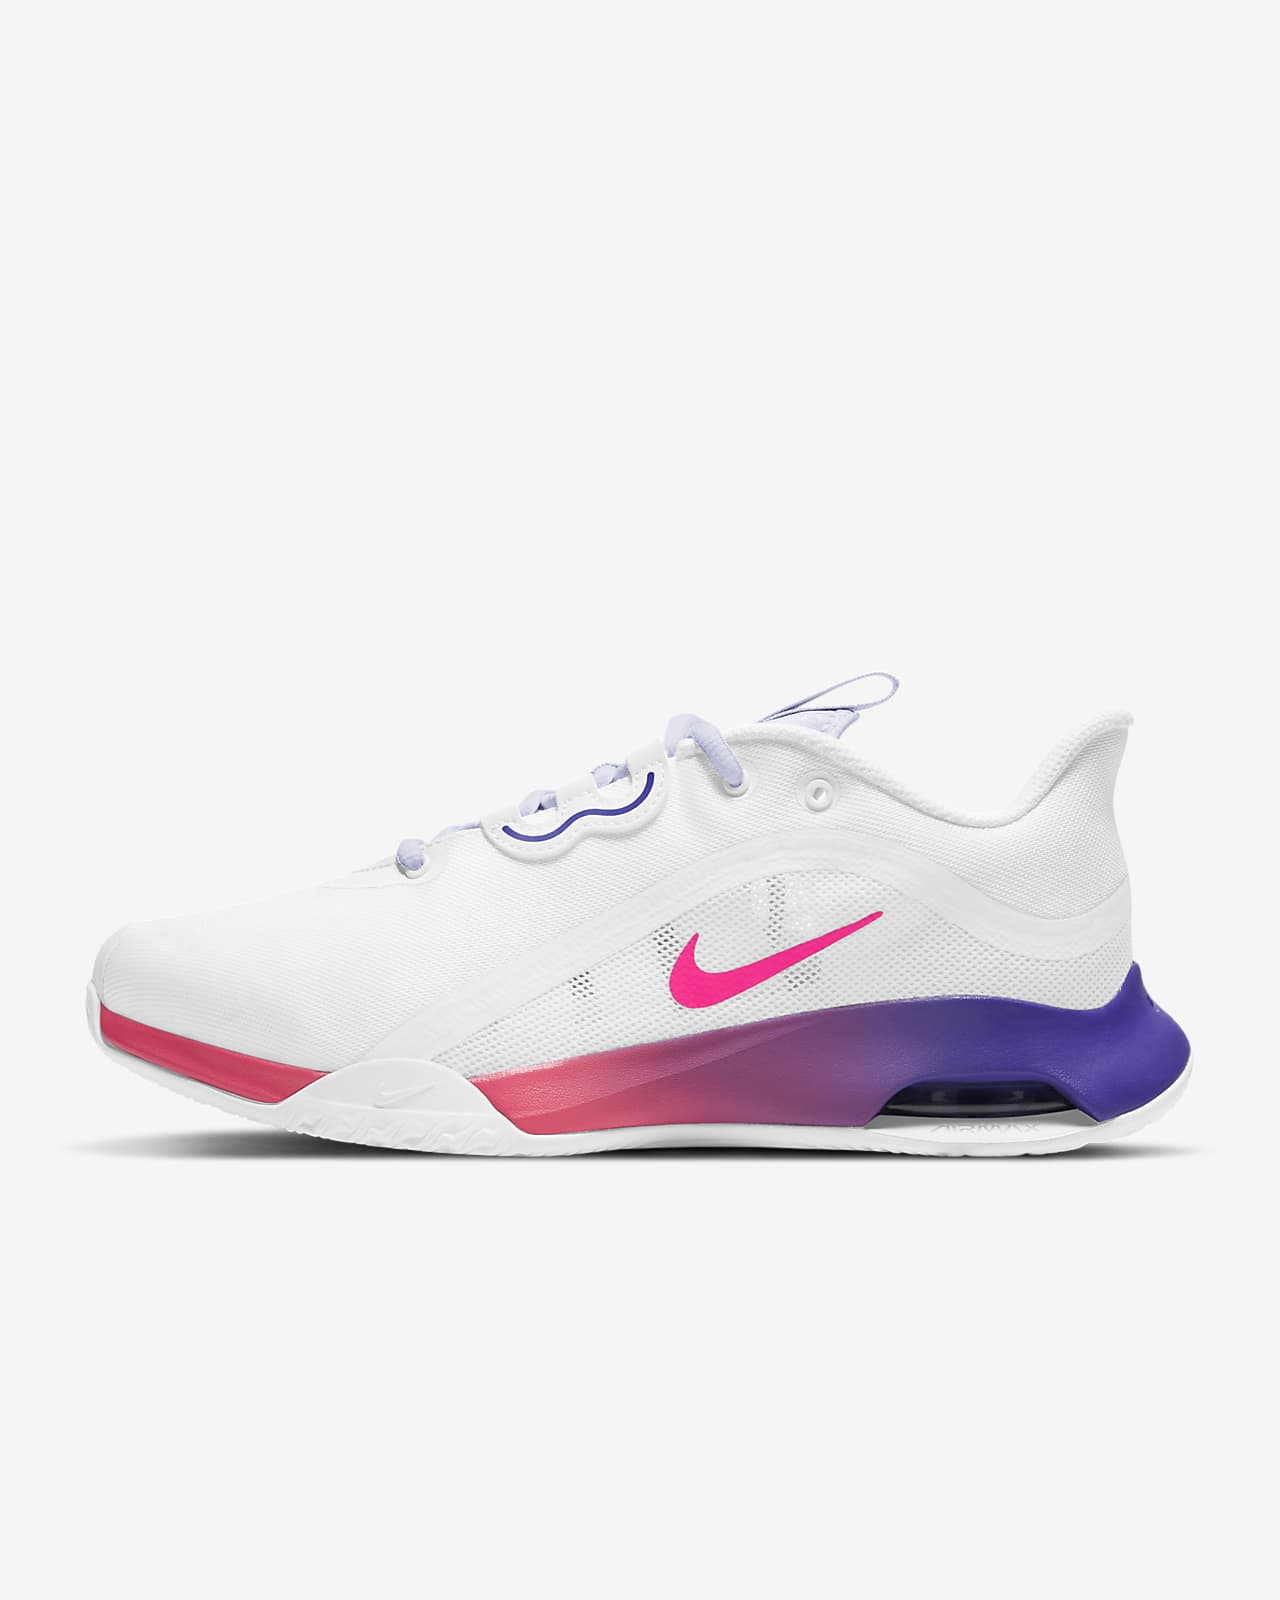 NikeCourt Air Max Volley 女款硬地球場網球鞋